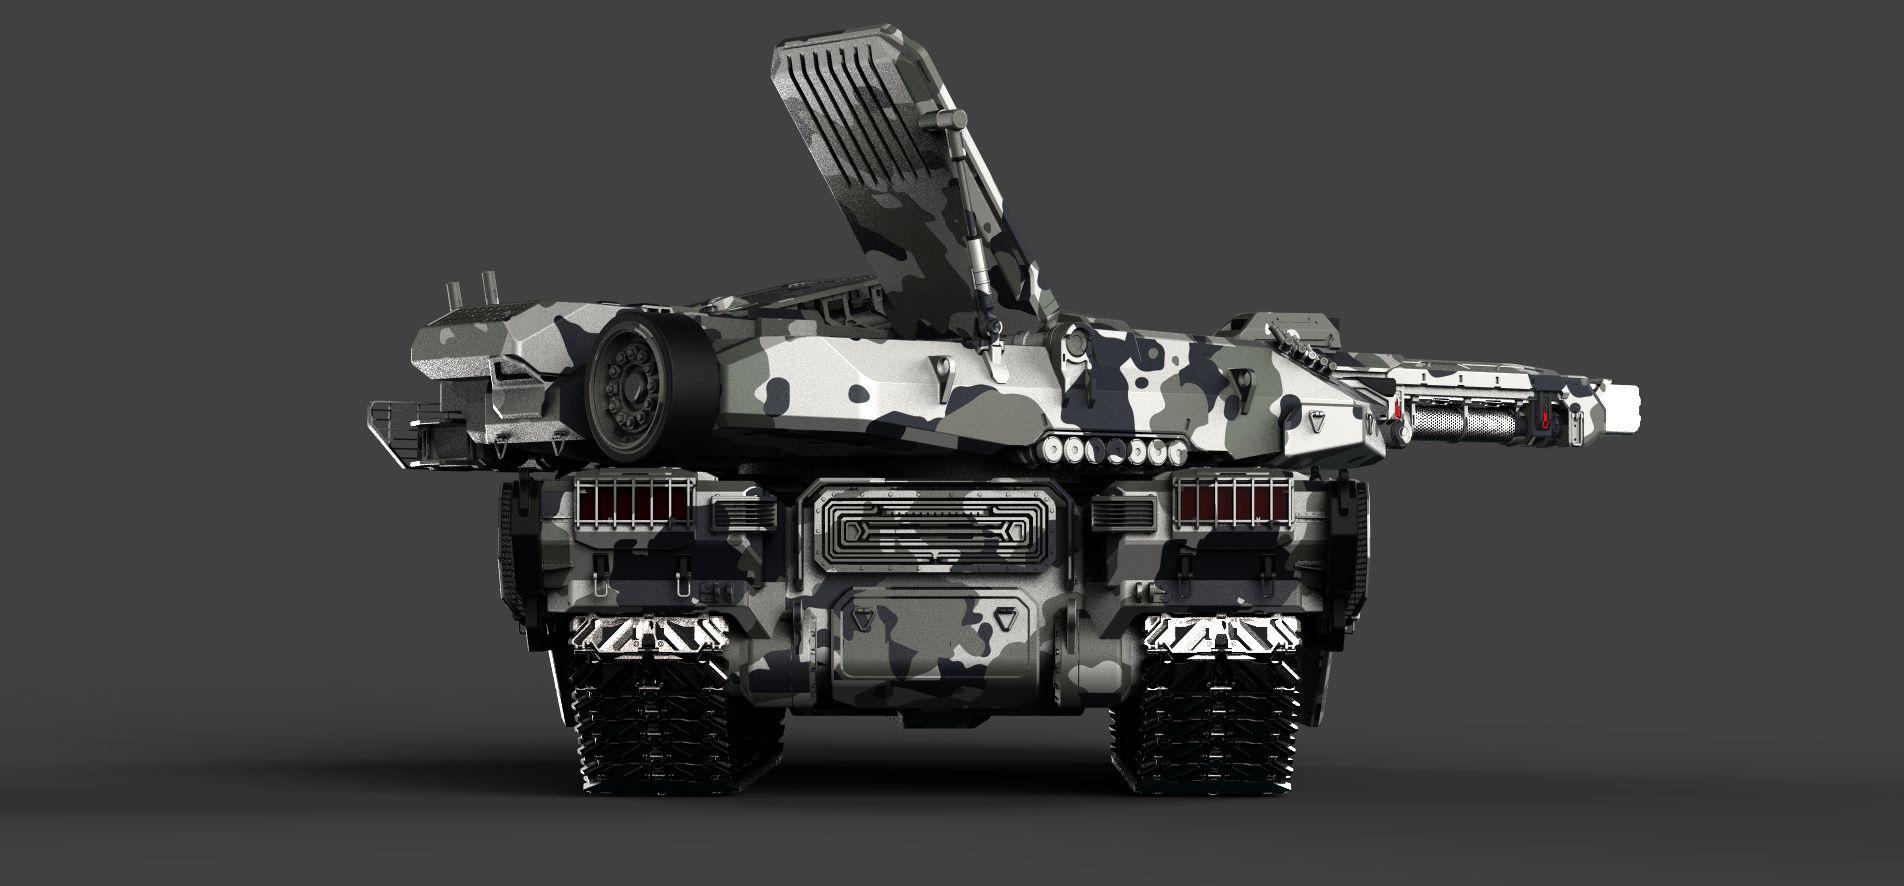 Tank-zevs-5-3500-3500